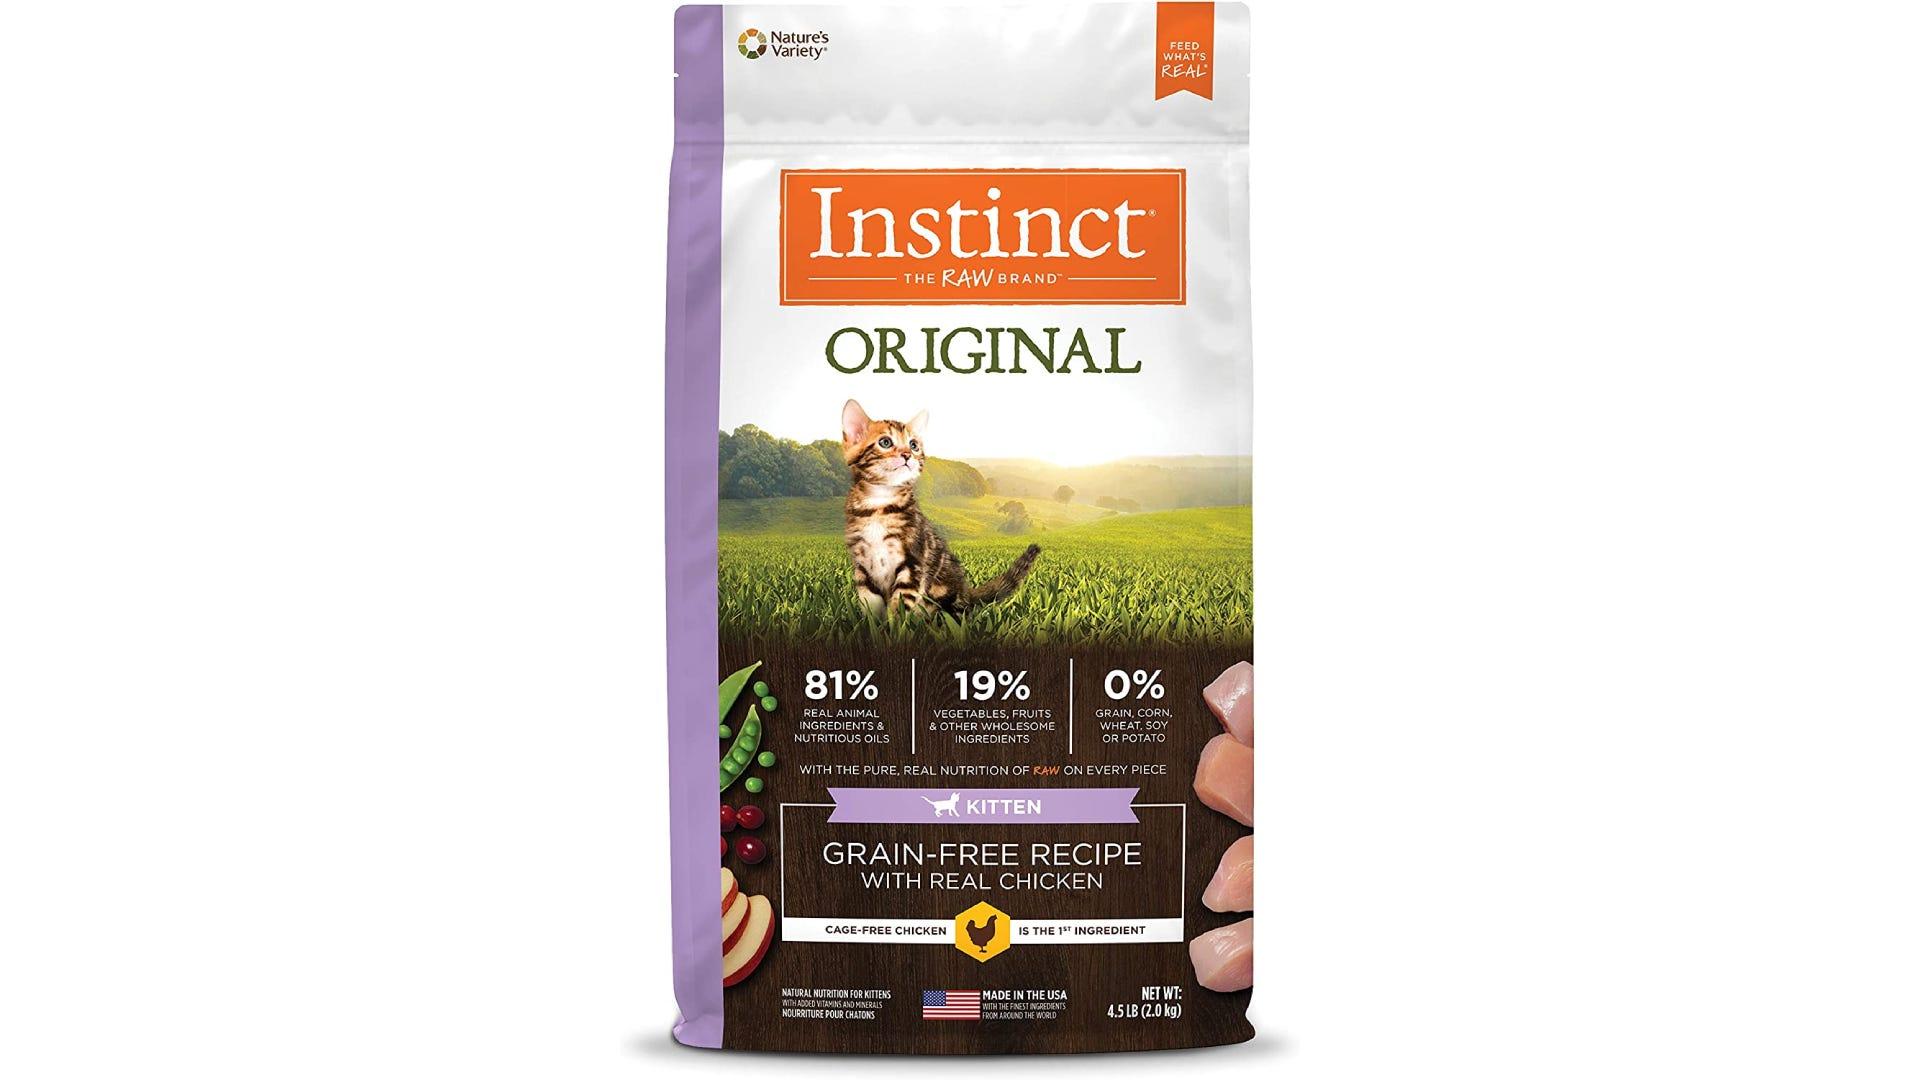 a bag of Instinct original cat food for kittens